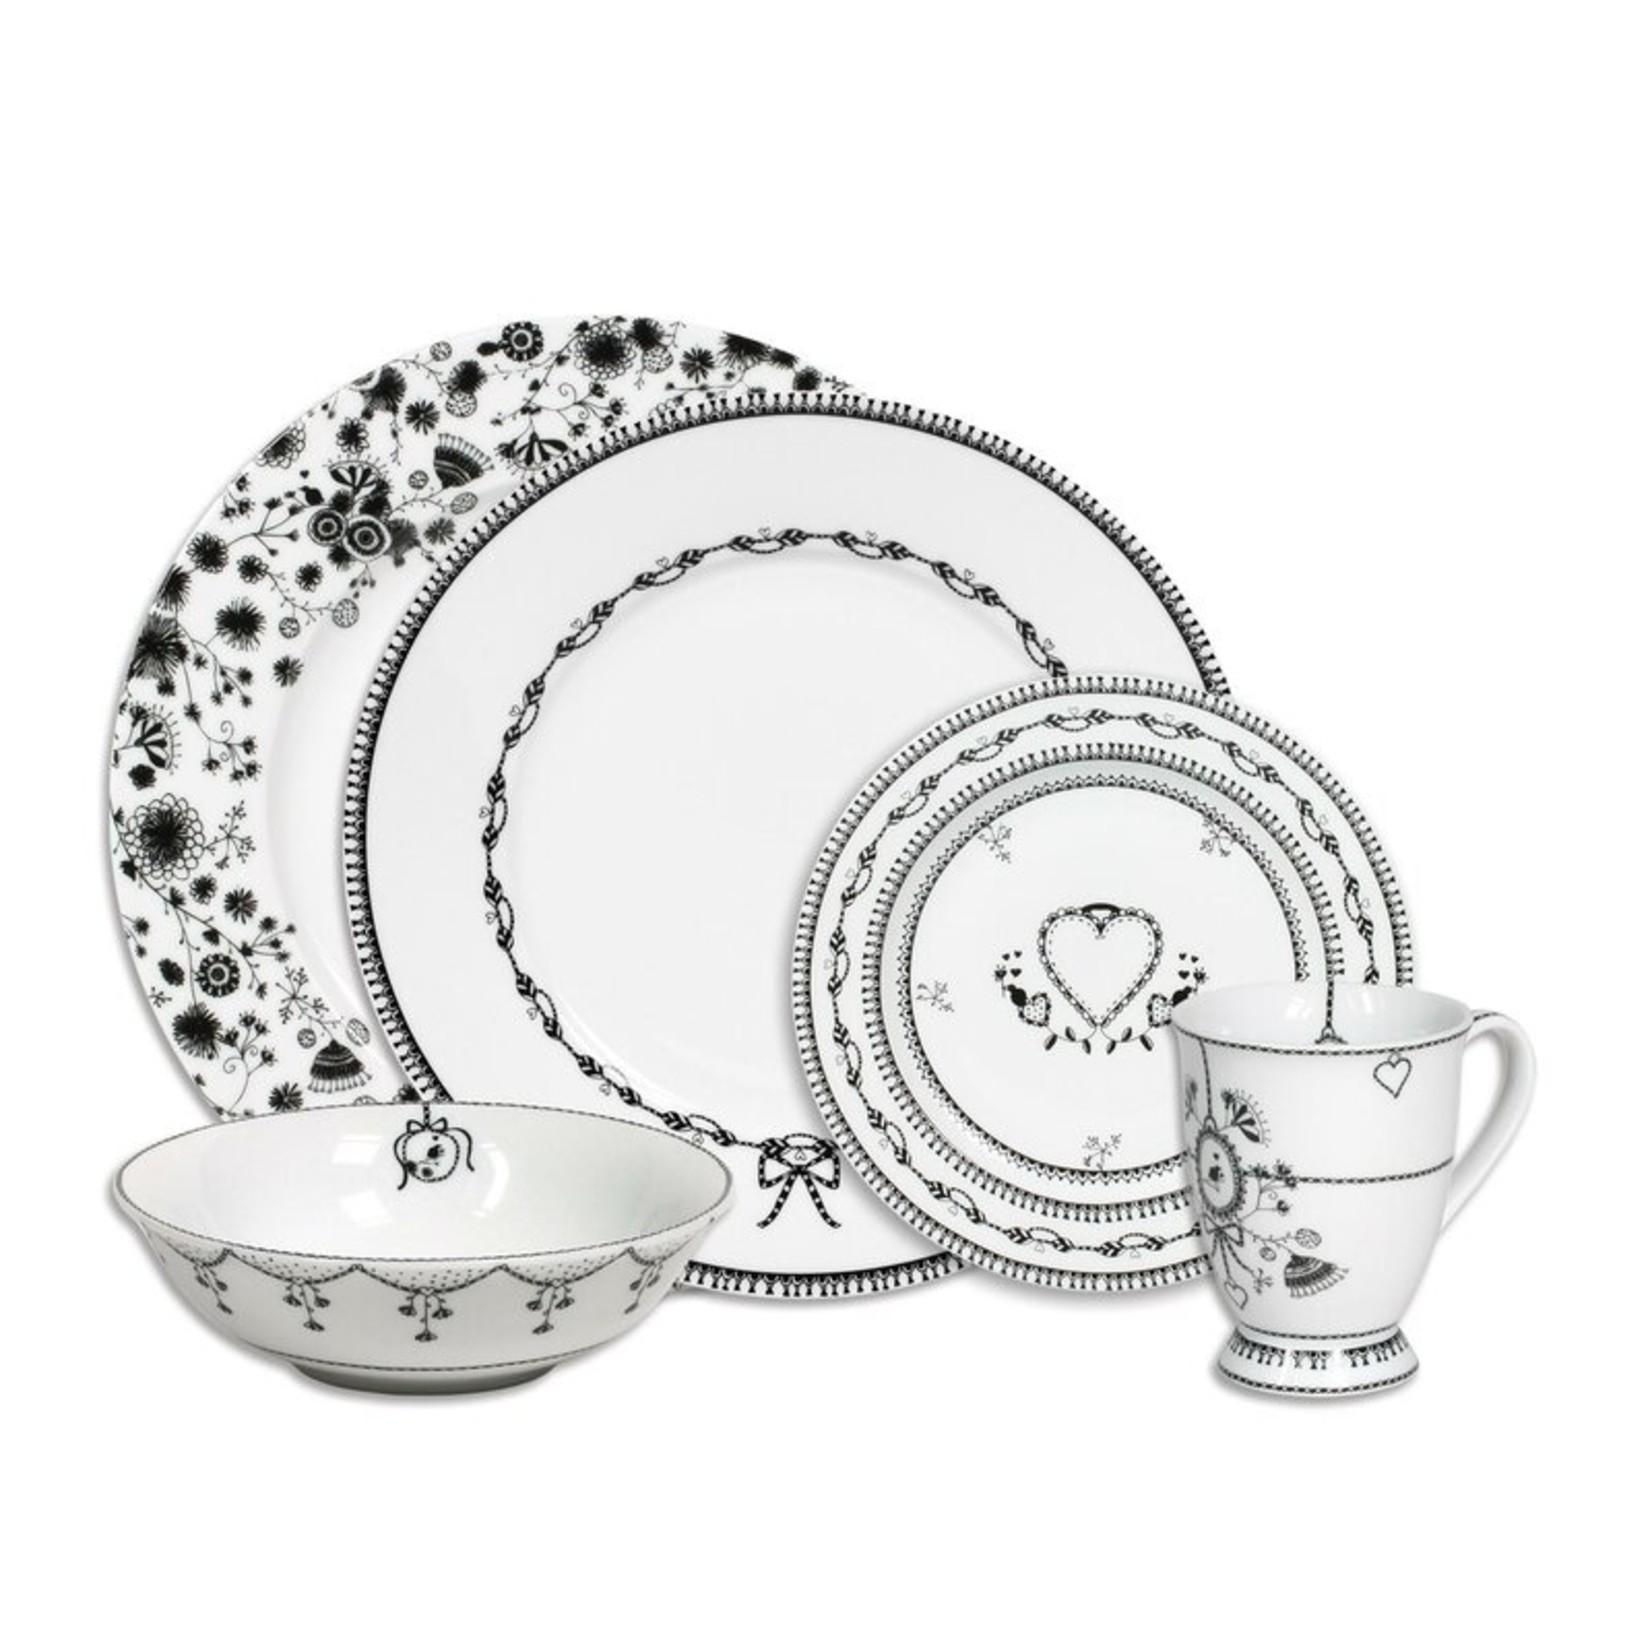 *Vina Blackbirdy Dinnerware - 5 Pieces, Service for 1